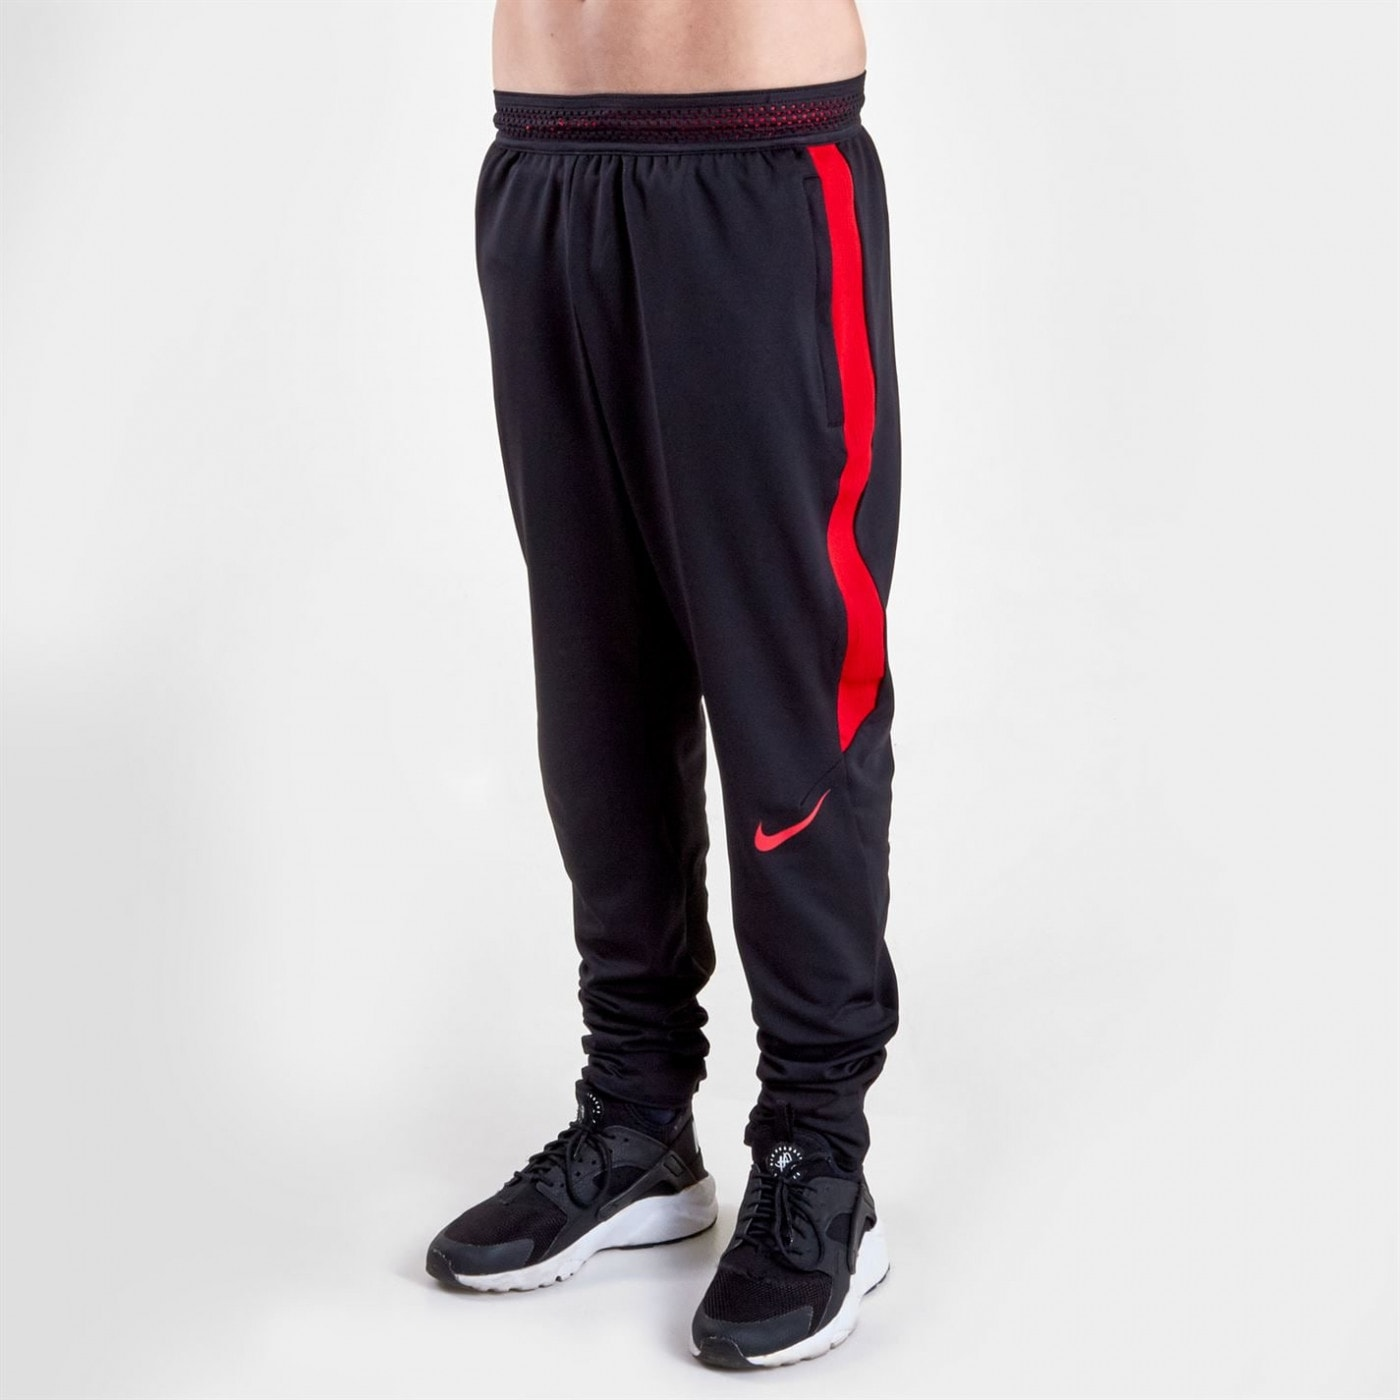 Nike Dry Fit Fleece Pants Juniors